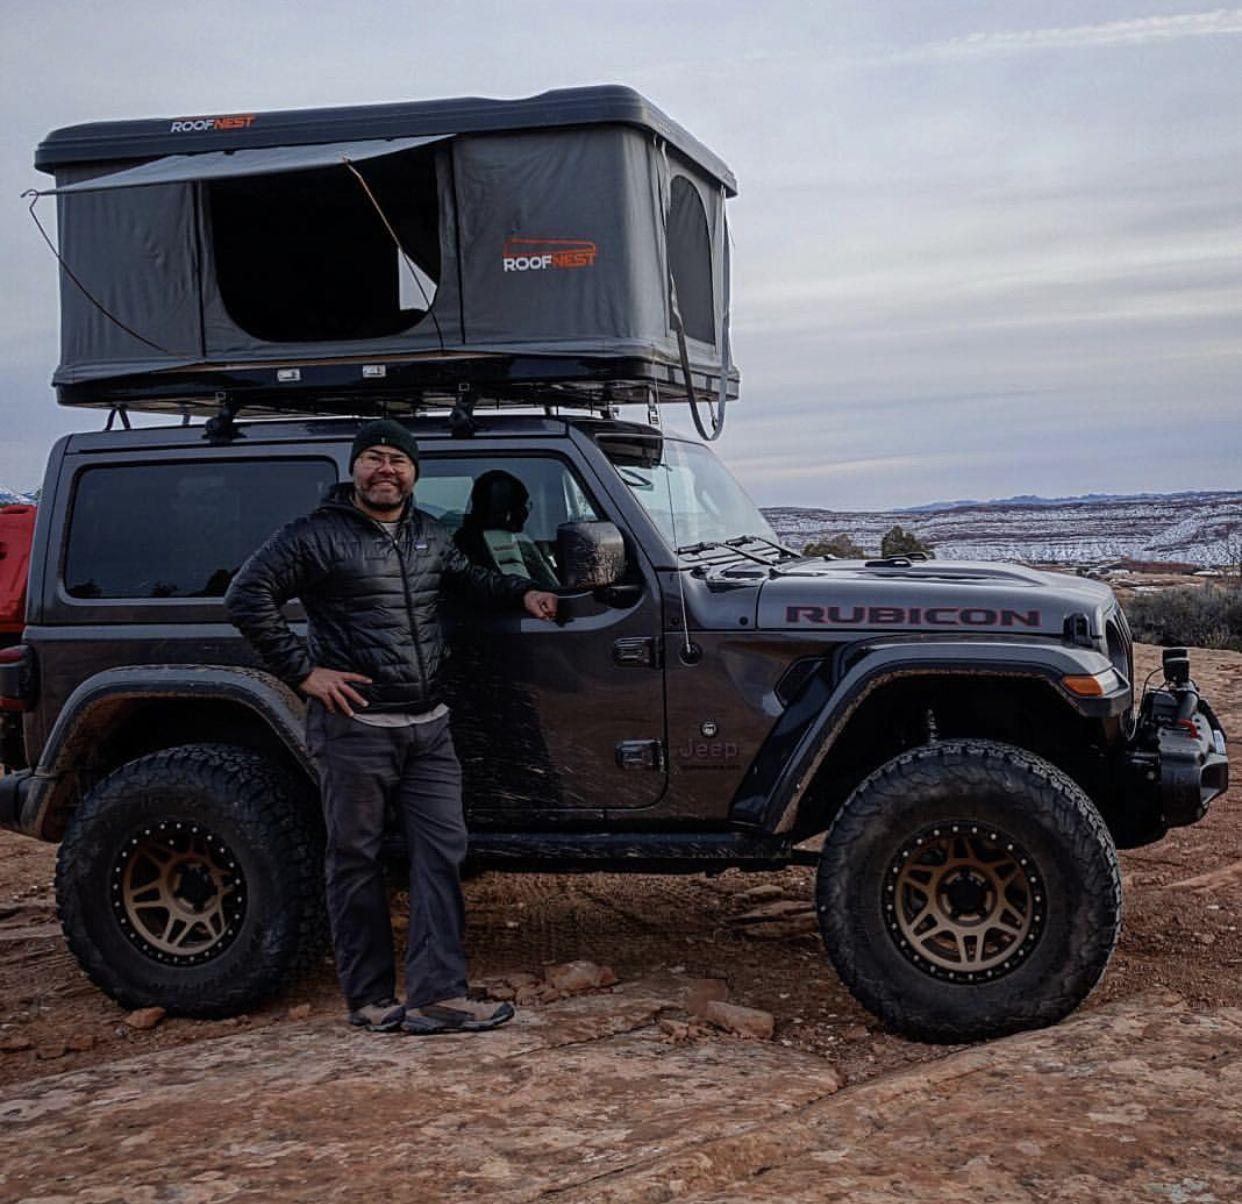 Overland Jeep Jeep Tent Dream Cars Jeep Jeep Jl